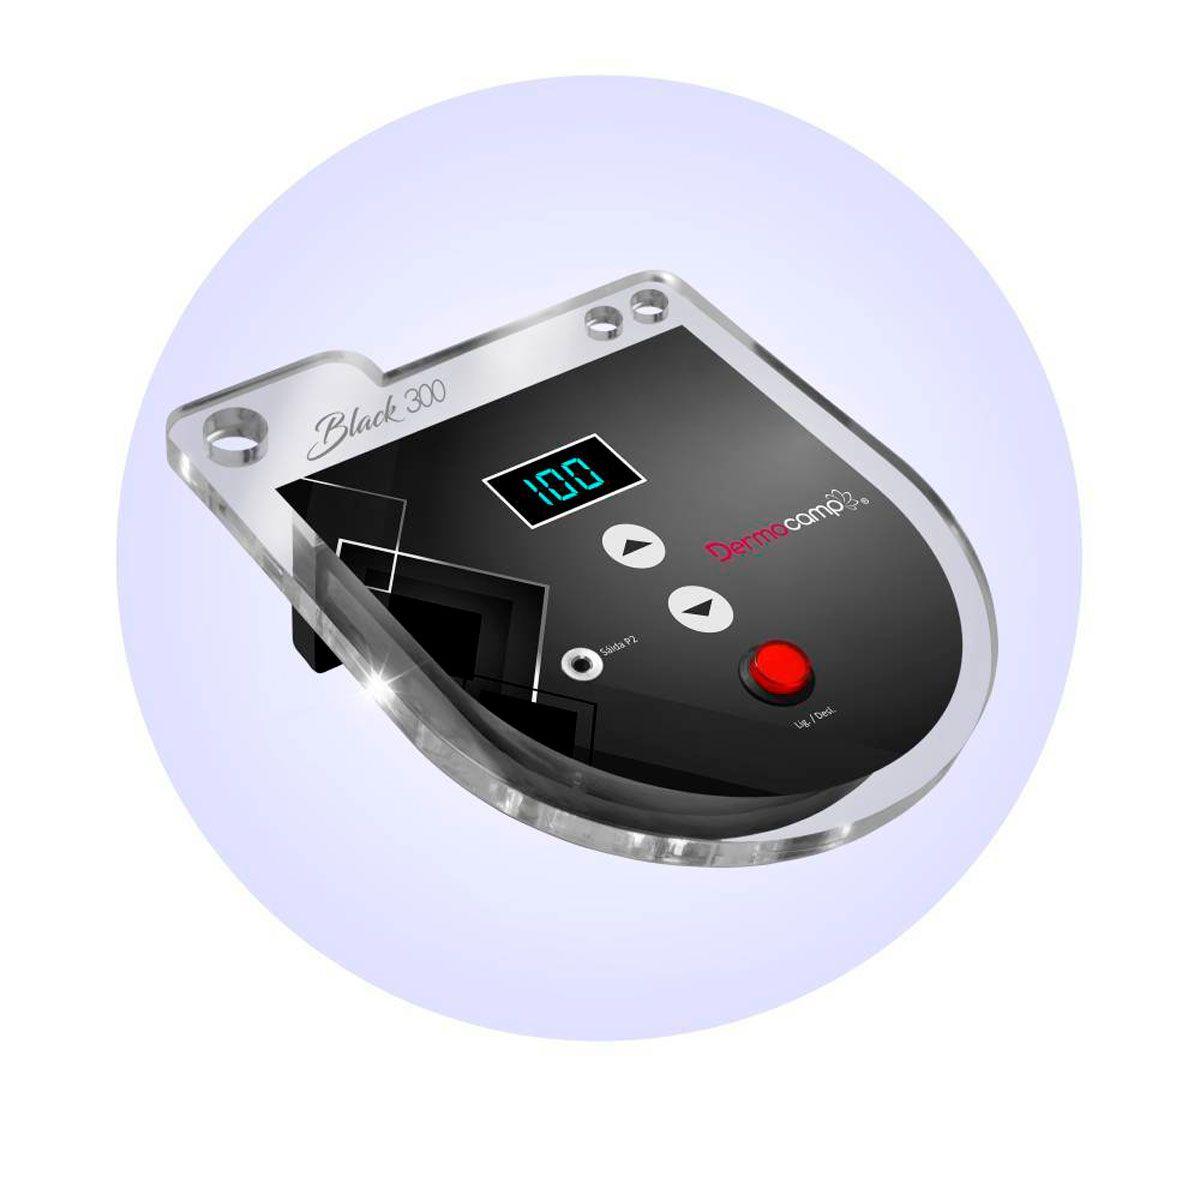 Controle de Velocidade Digital Dermocamp Black